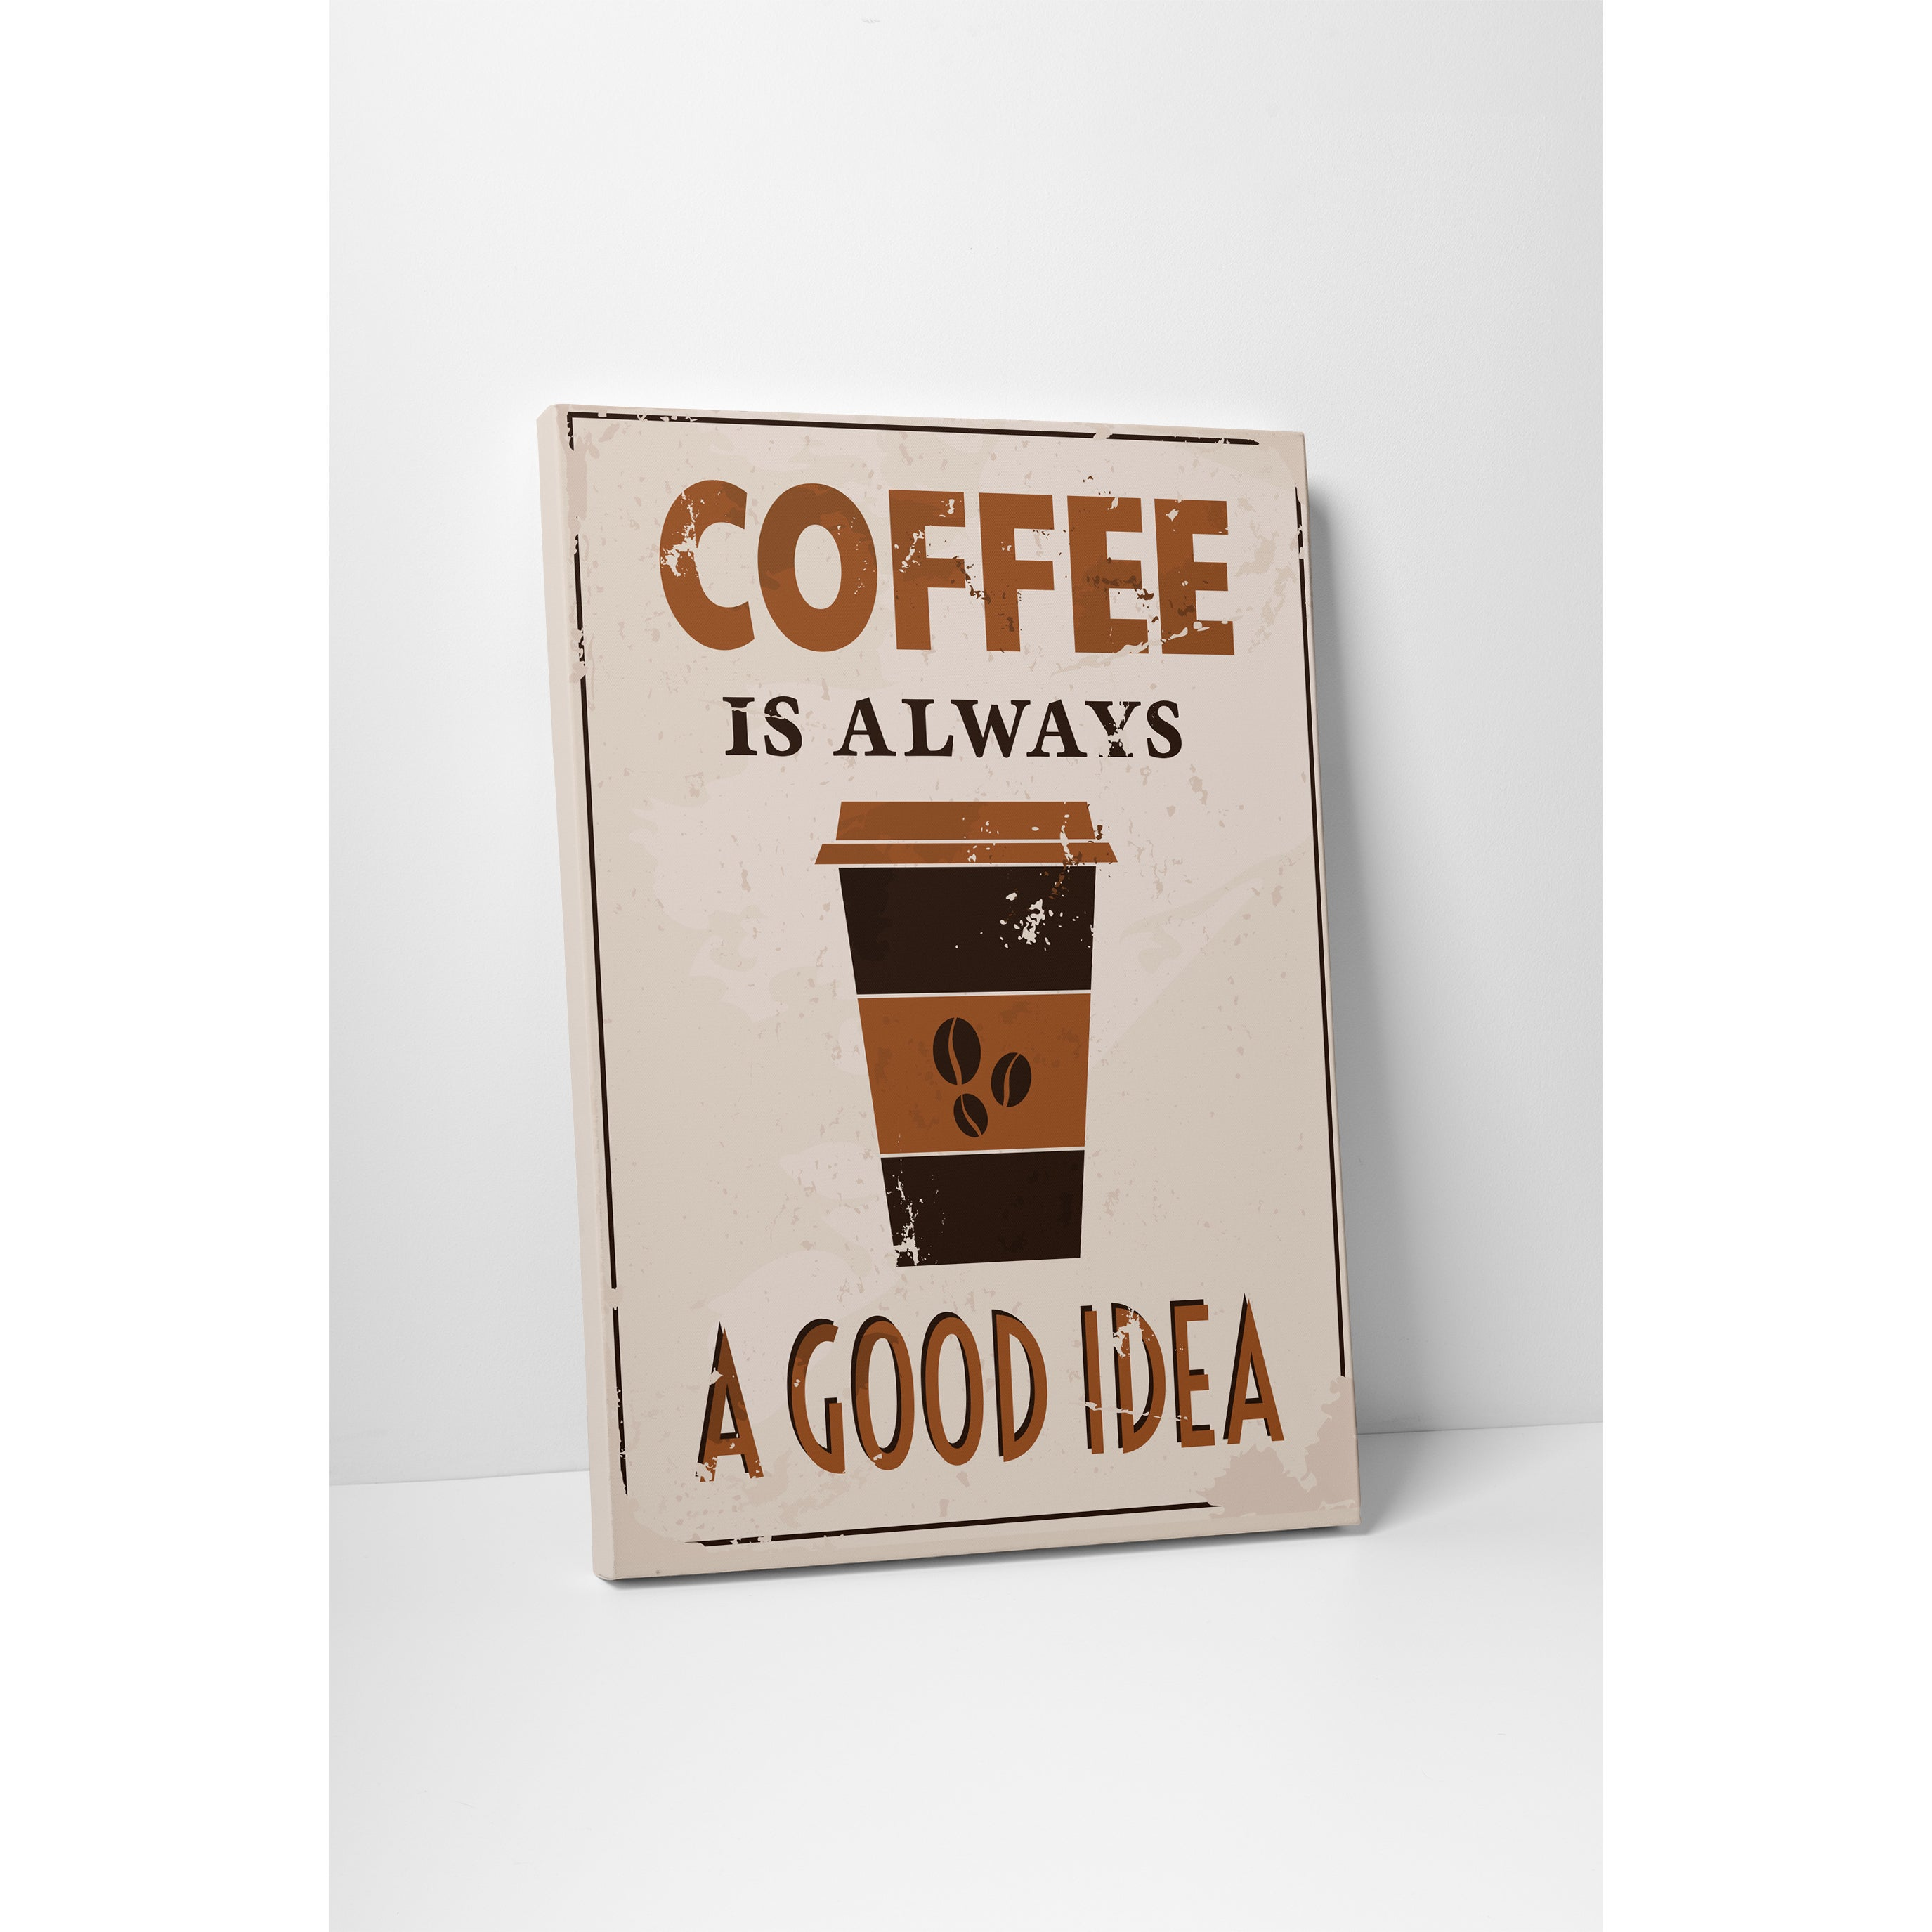 Vintage Metal (Grey) Signs 'Coffee is Always a Good Idea'...